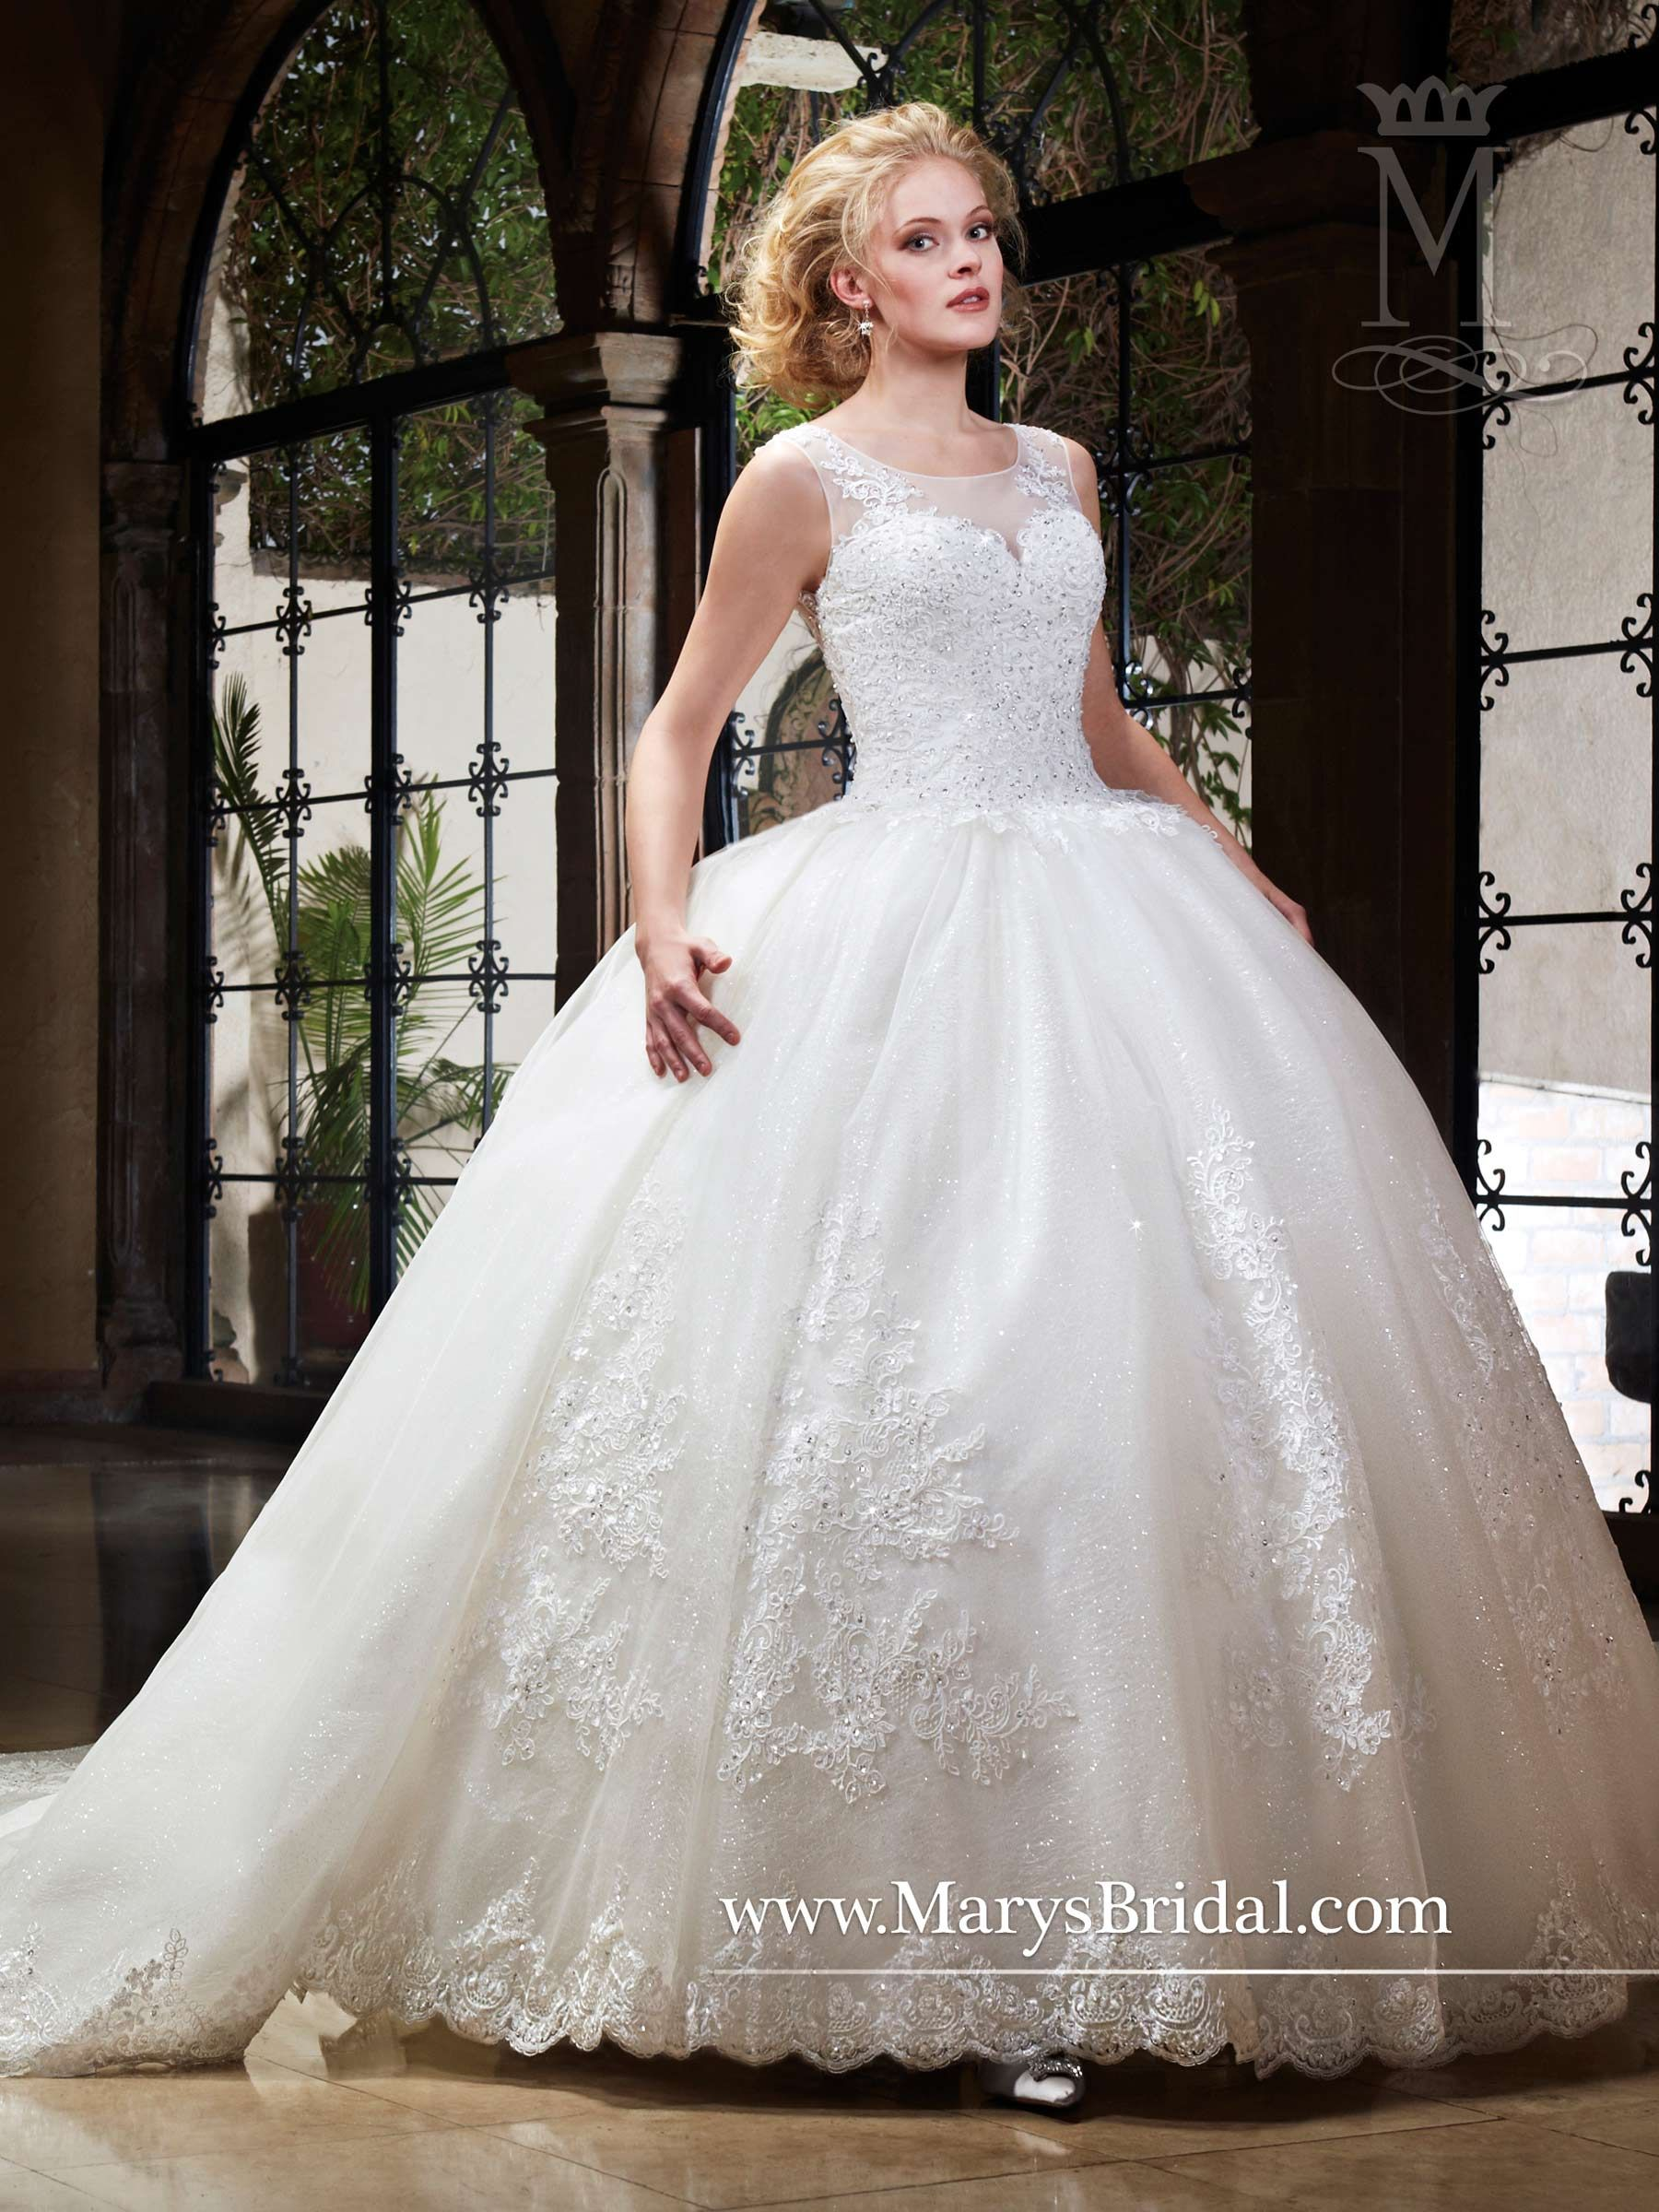 New Arrival Real Photo Sweetheart White Bride Gowns Vestidos De Noiva Pleat Chiffon Mermaid Wedding Dresses 2015 Wd201 Wedding Dresses